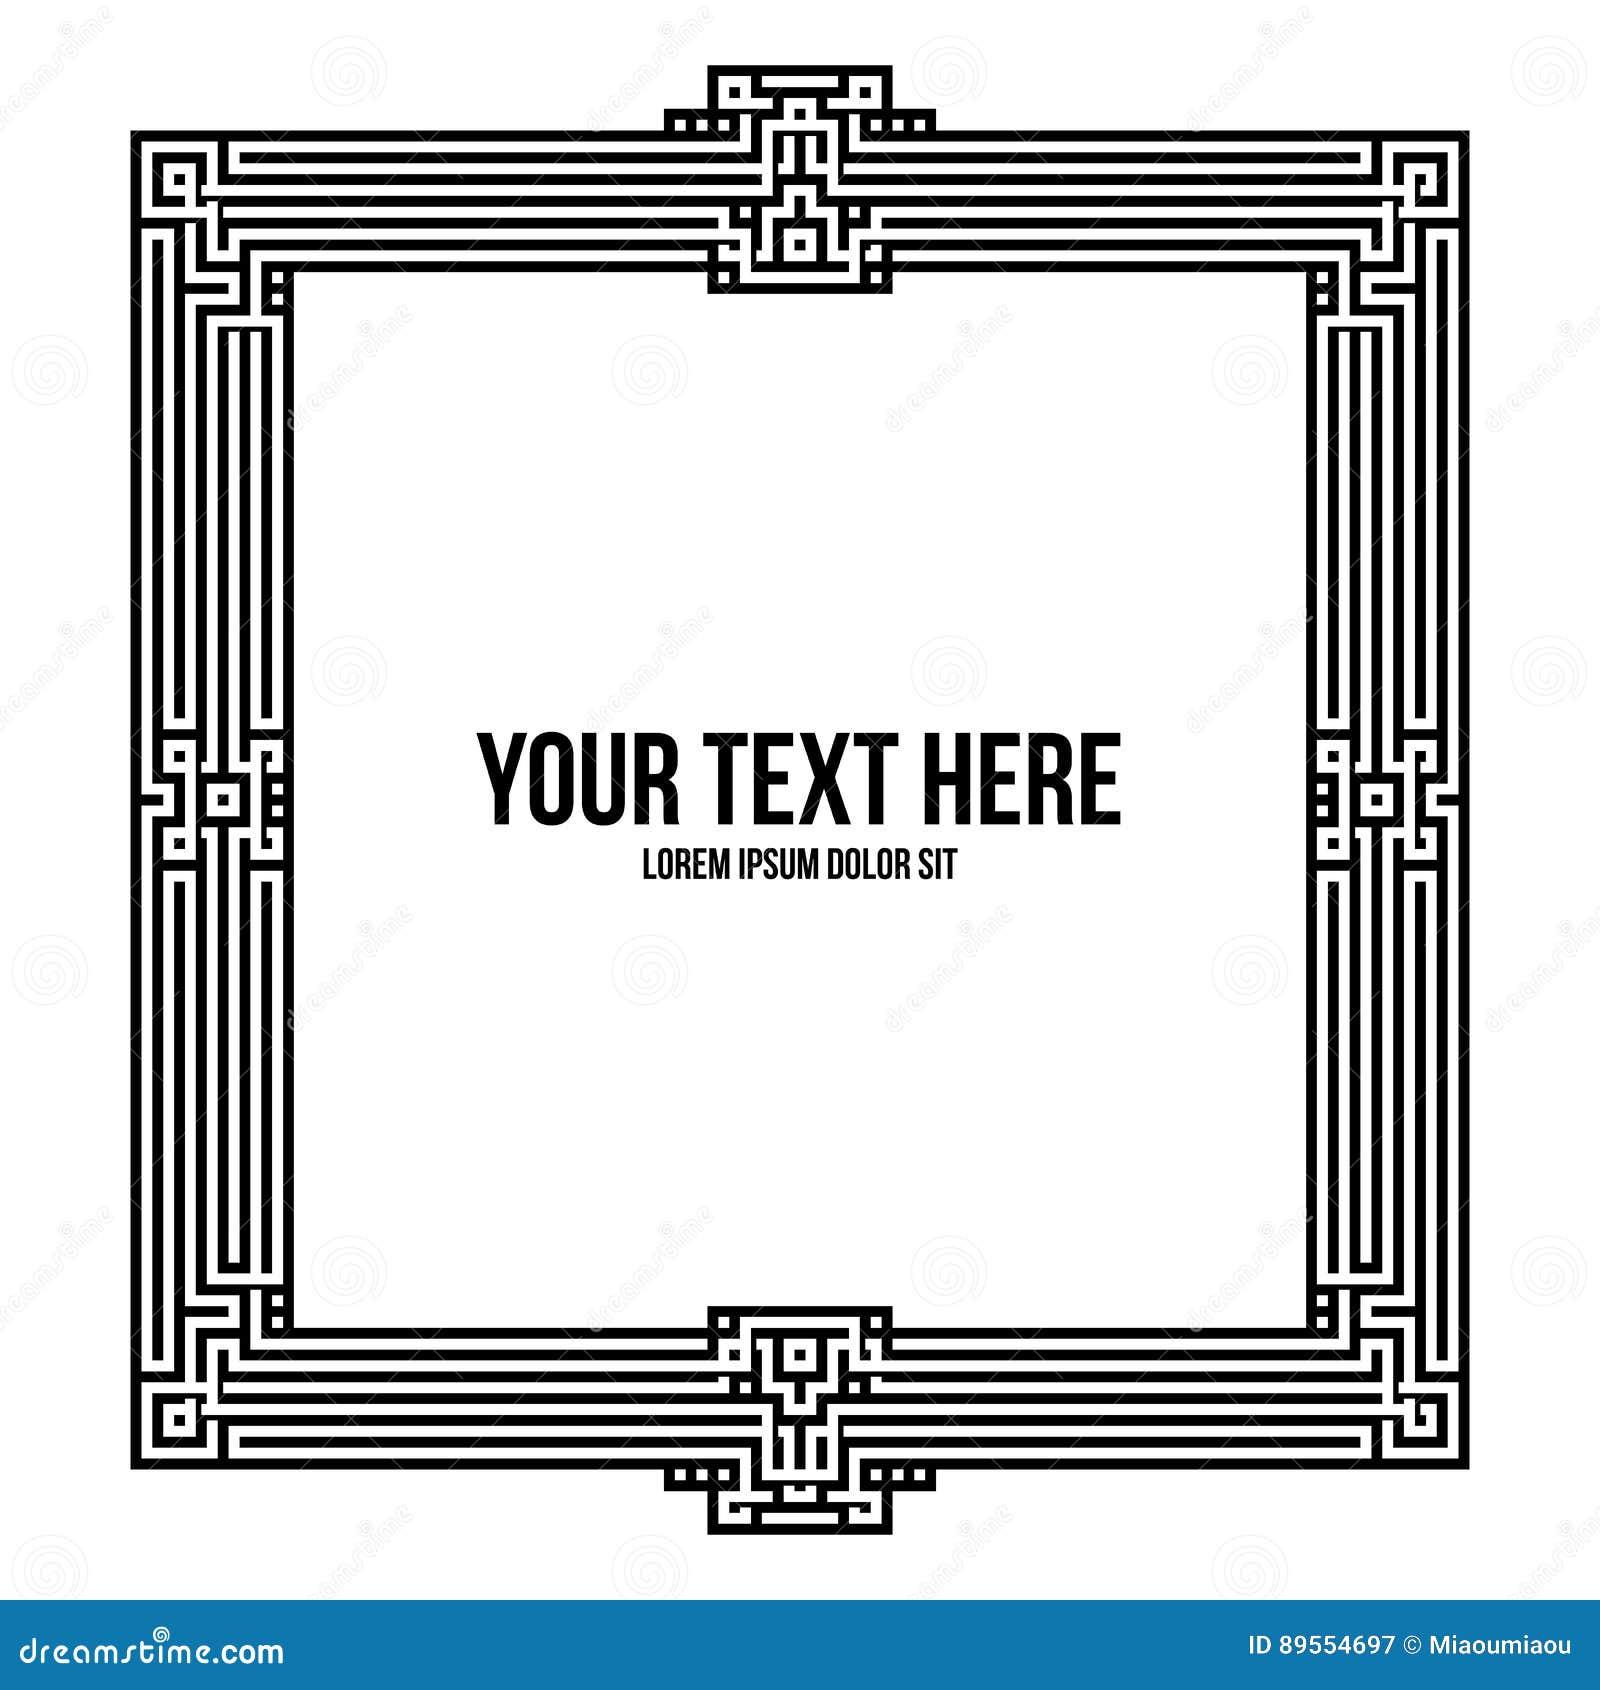 art deco square frame with native american elements stock vector illustration 89554697. Black Bedroom Furniture Sets. Home Design Ideas